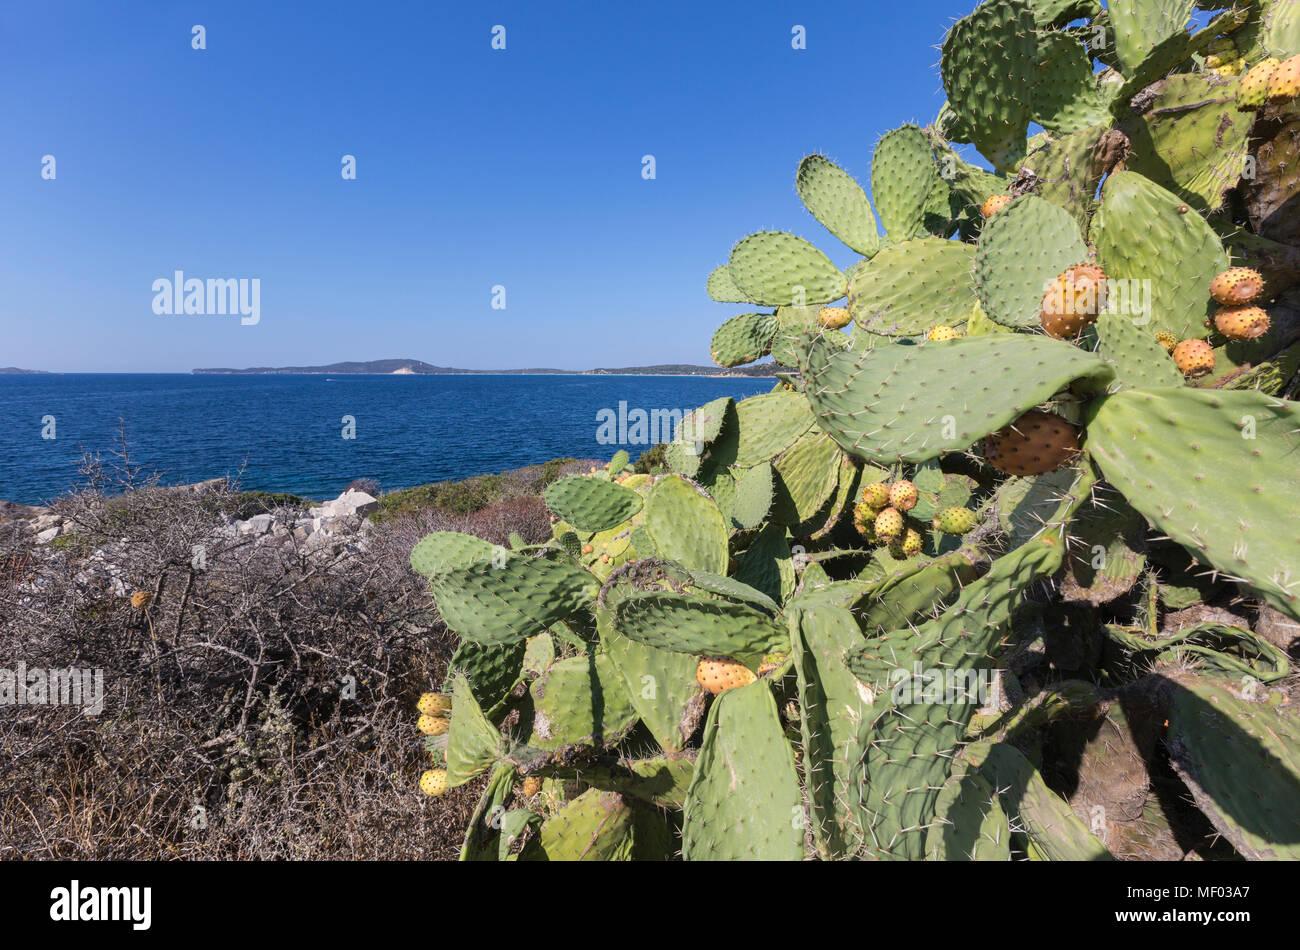 Prickly pears of the inland frame the blue sea Punta Molentis Villasimius Cagliari Sardinia Italy Europe - Stock Image